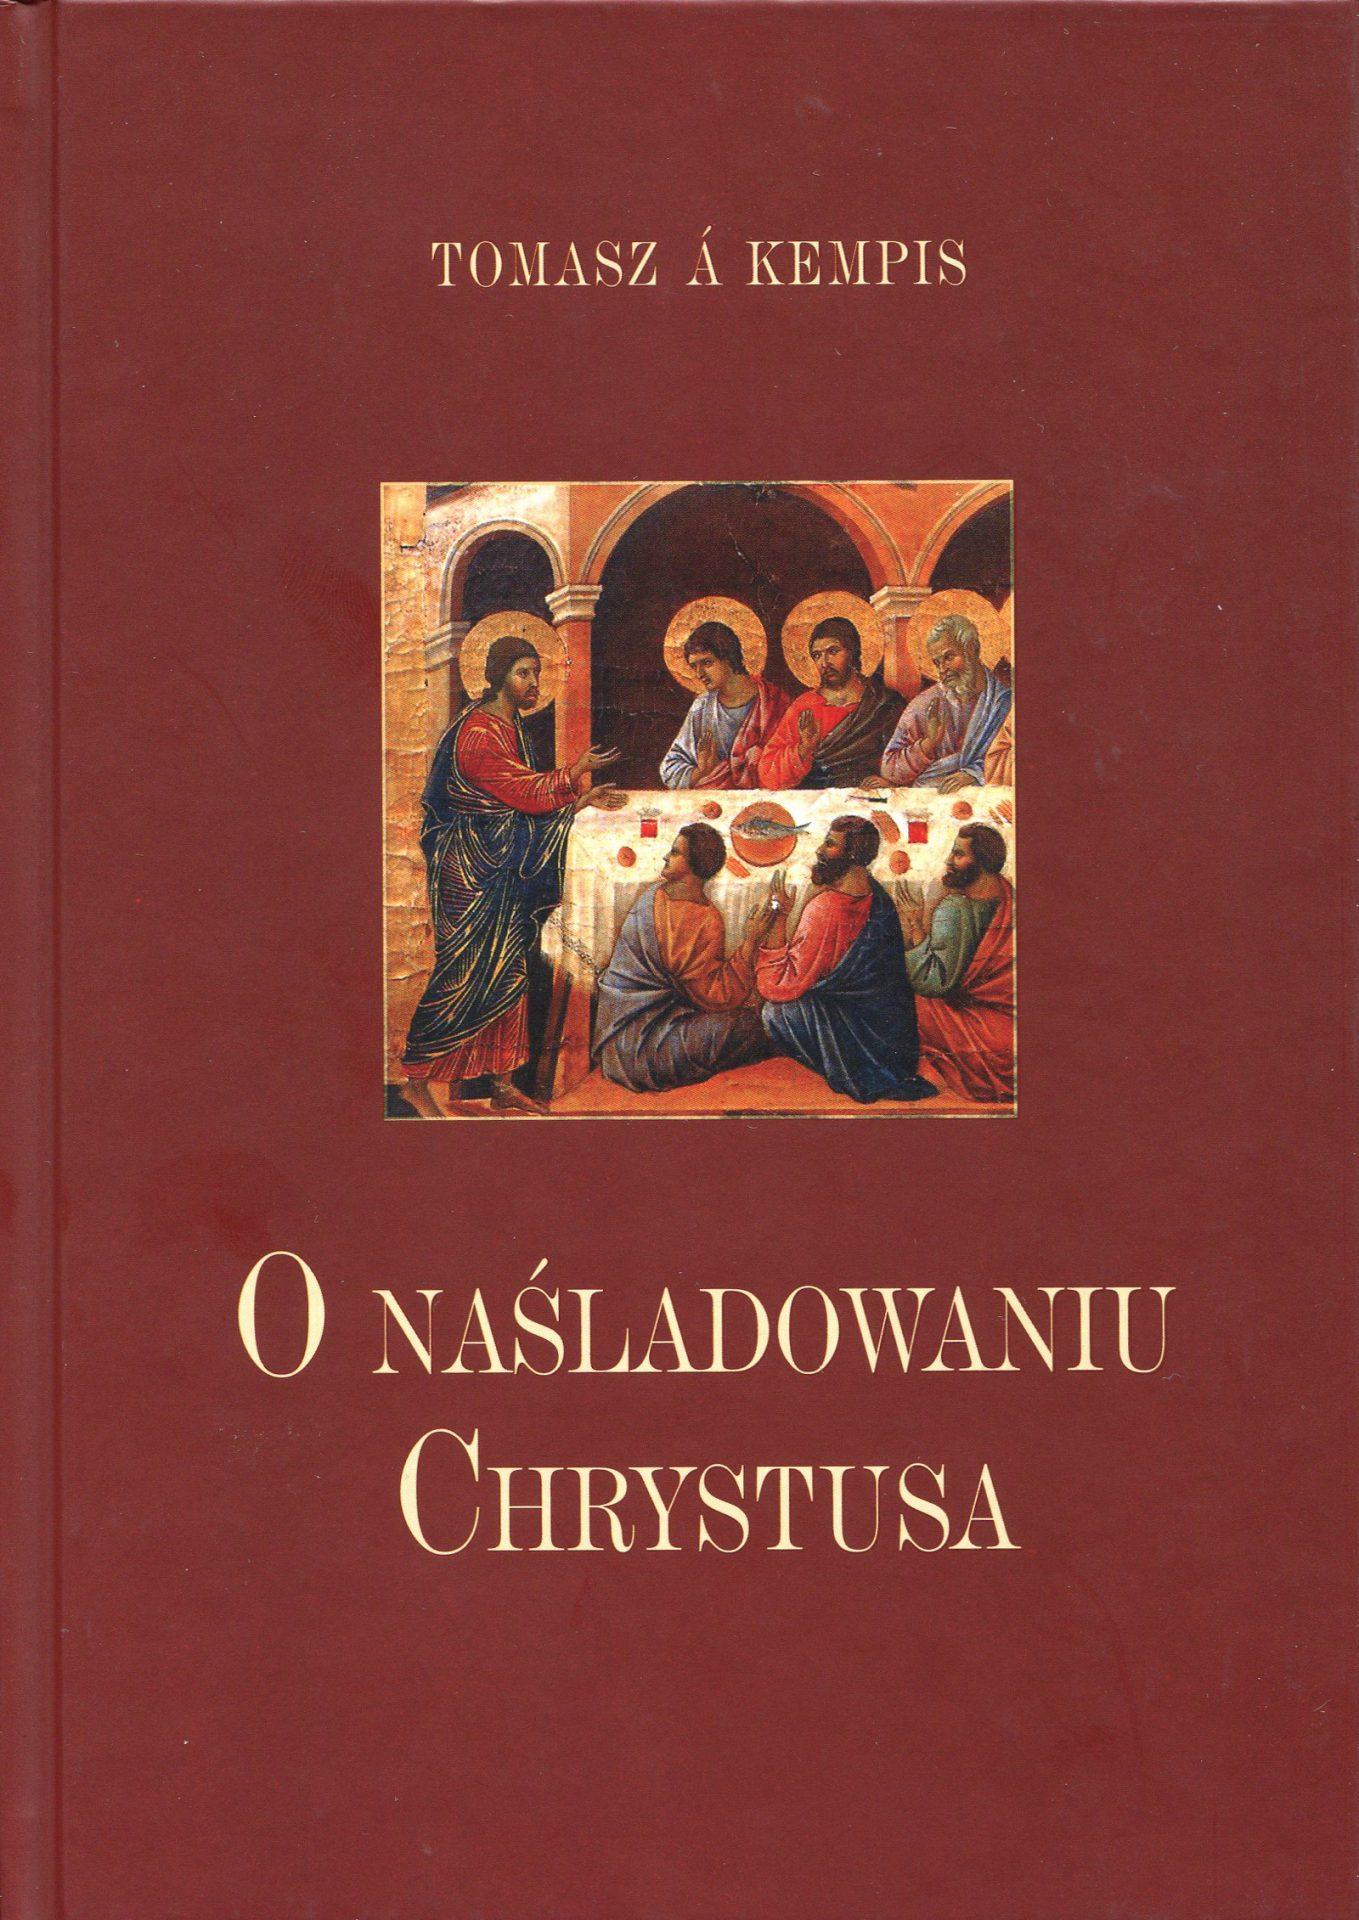 O naśladowaniu Chrystusa - Tomasz Kempis